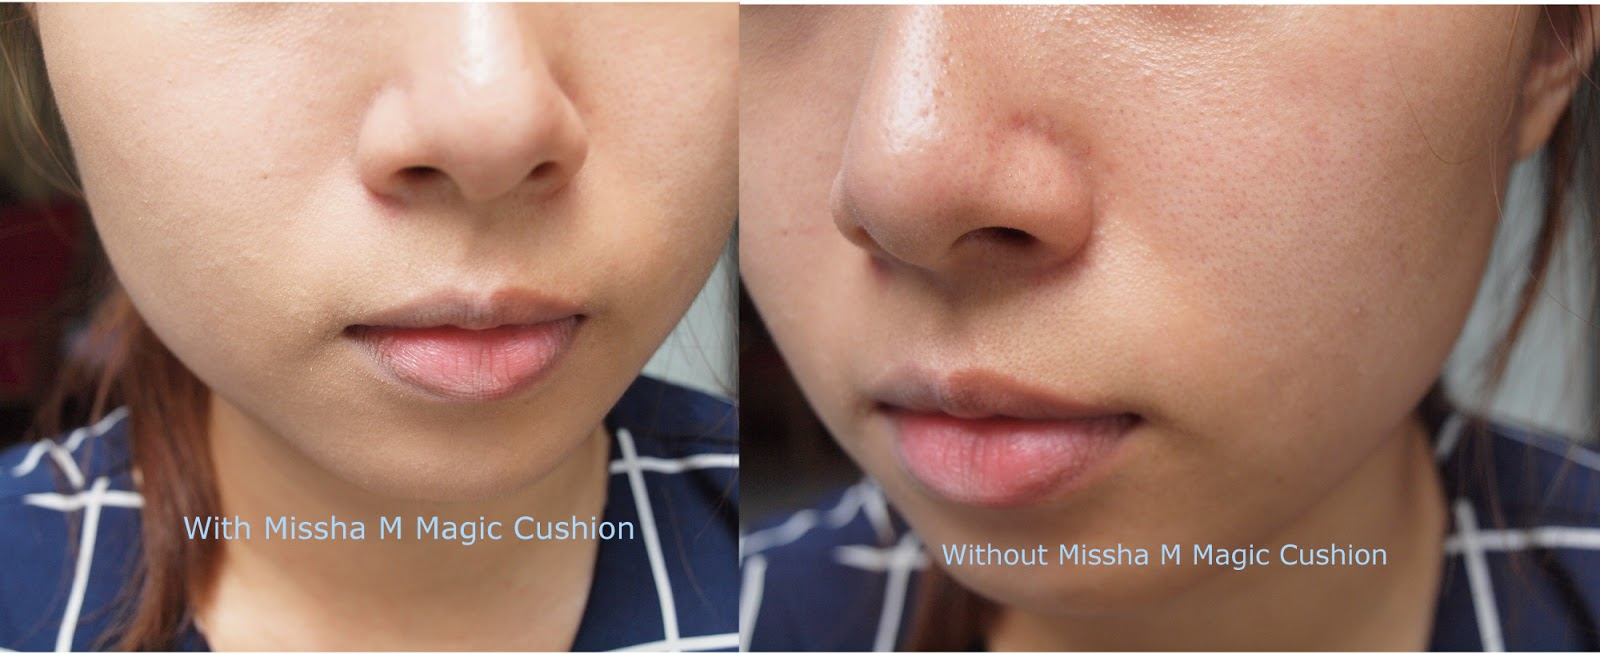 Missha X Minions M Magic Cushion Review Jravelog